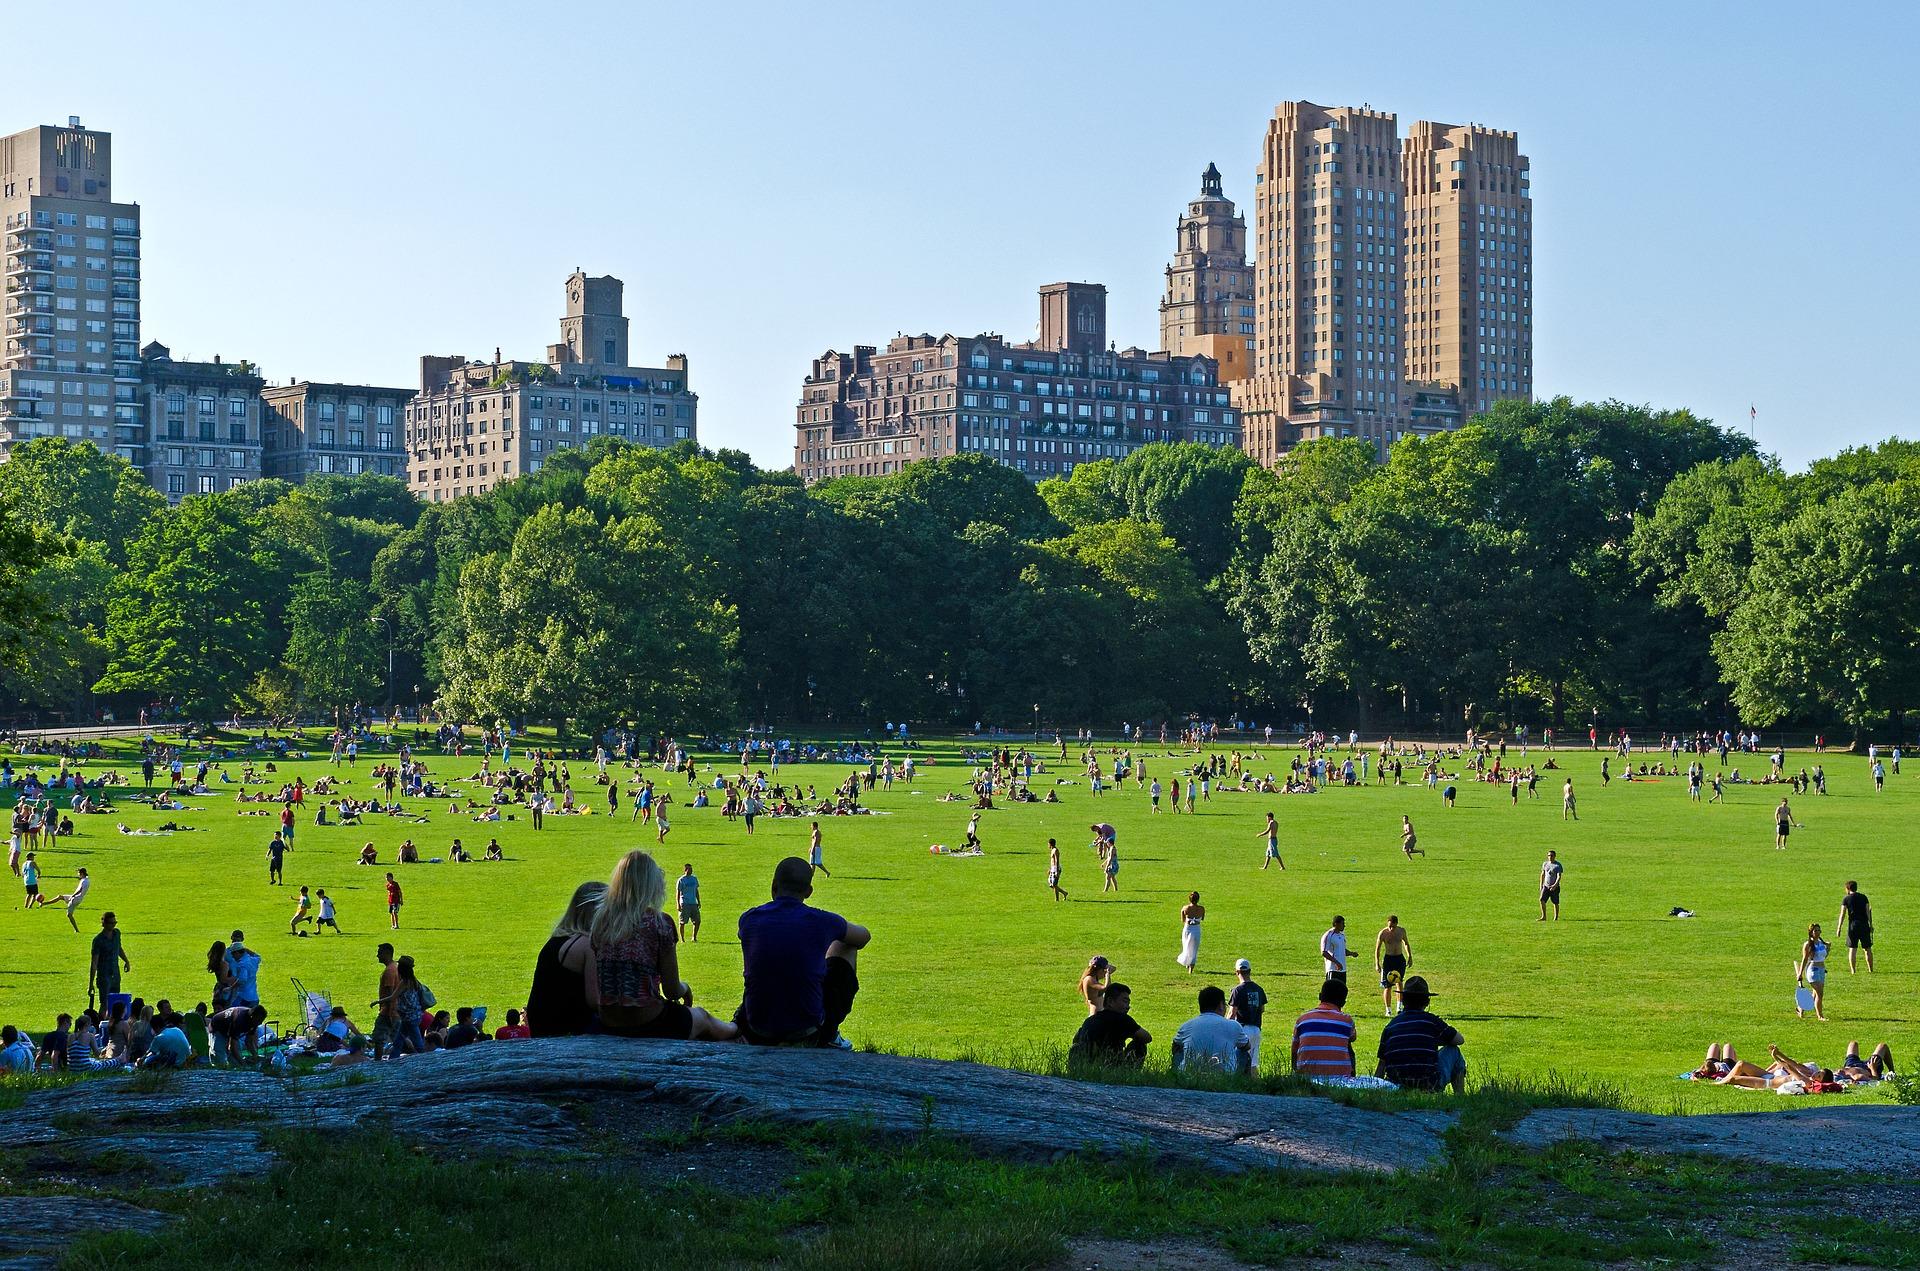 Nova Iorque proíbe veículos no Central Park